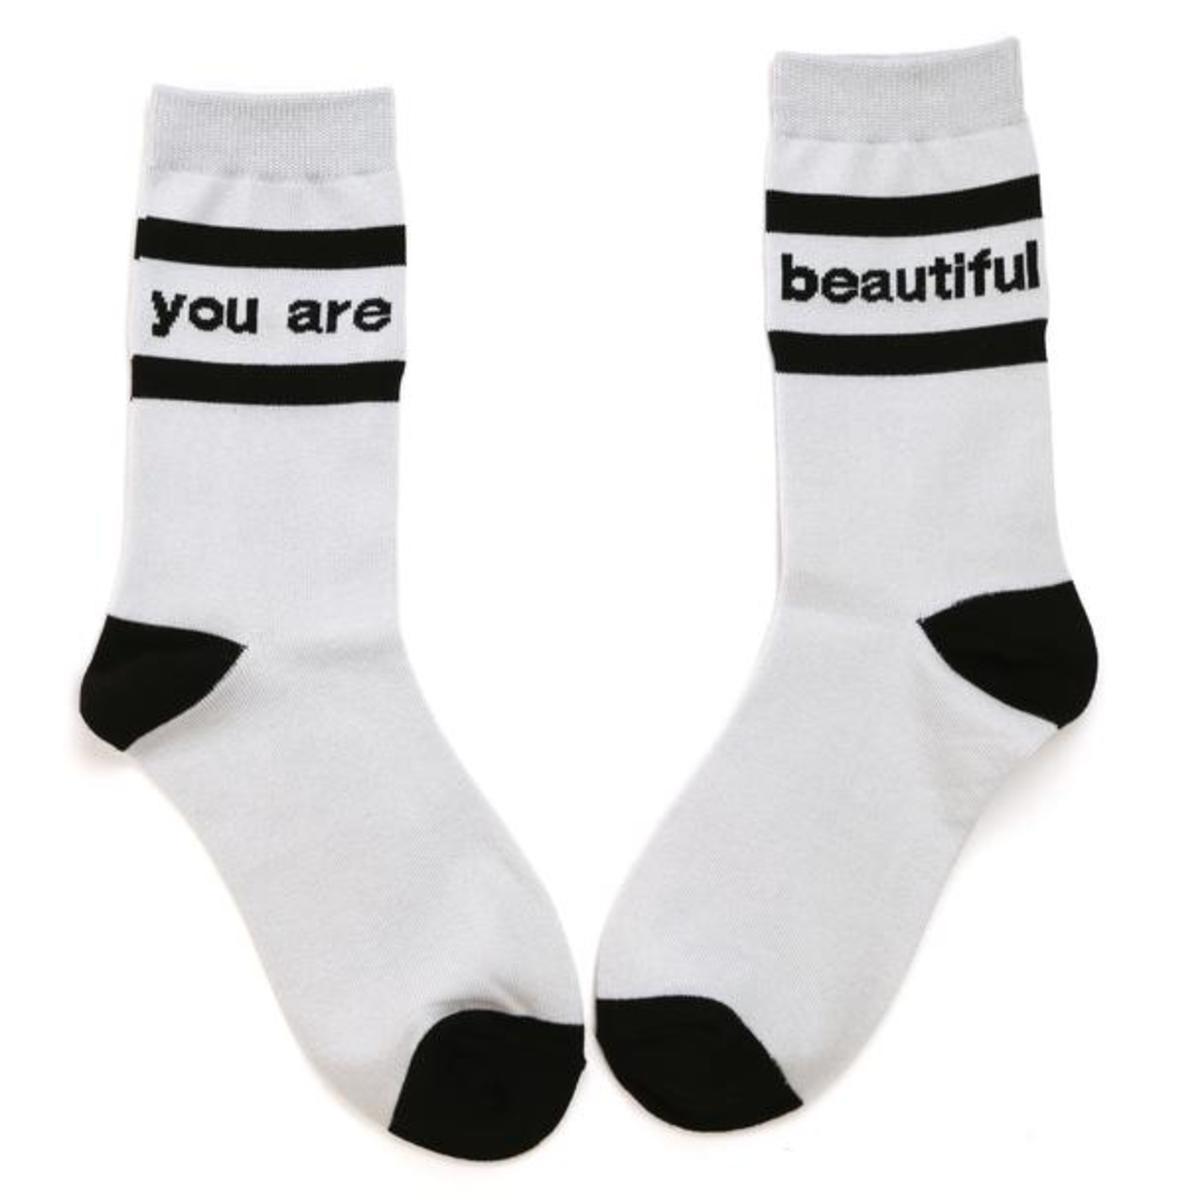 you_are_beautiful_socks_608x608